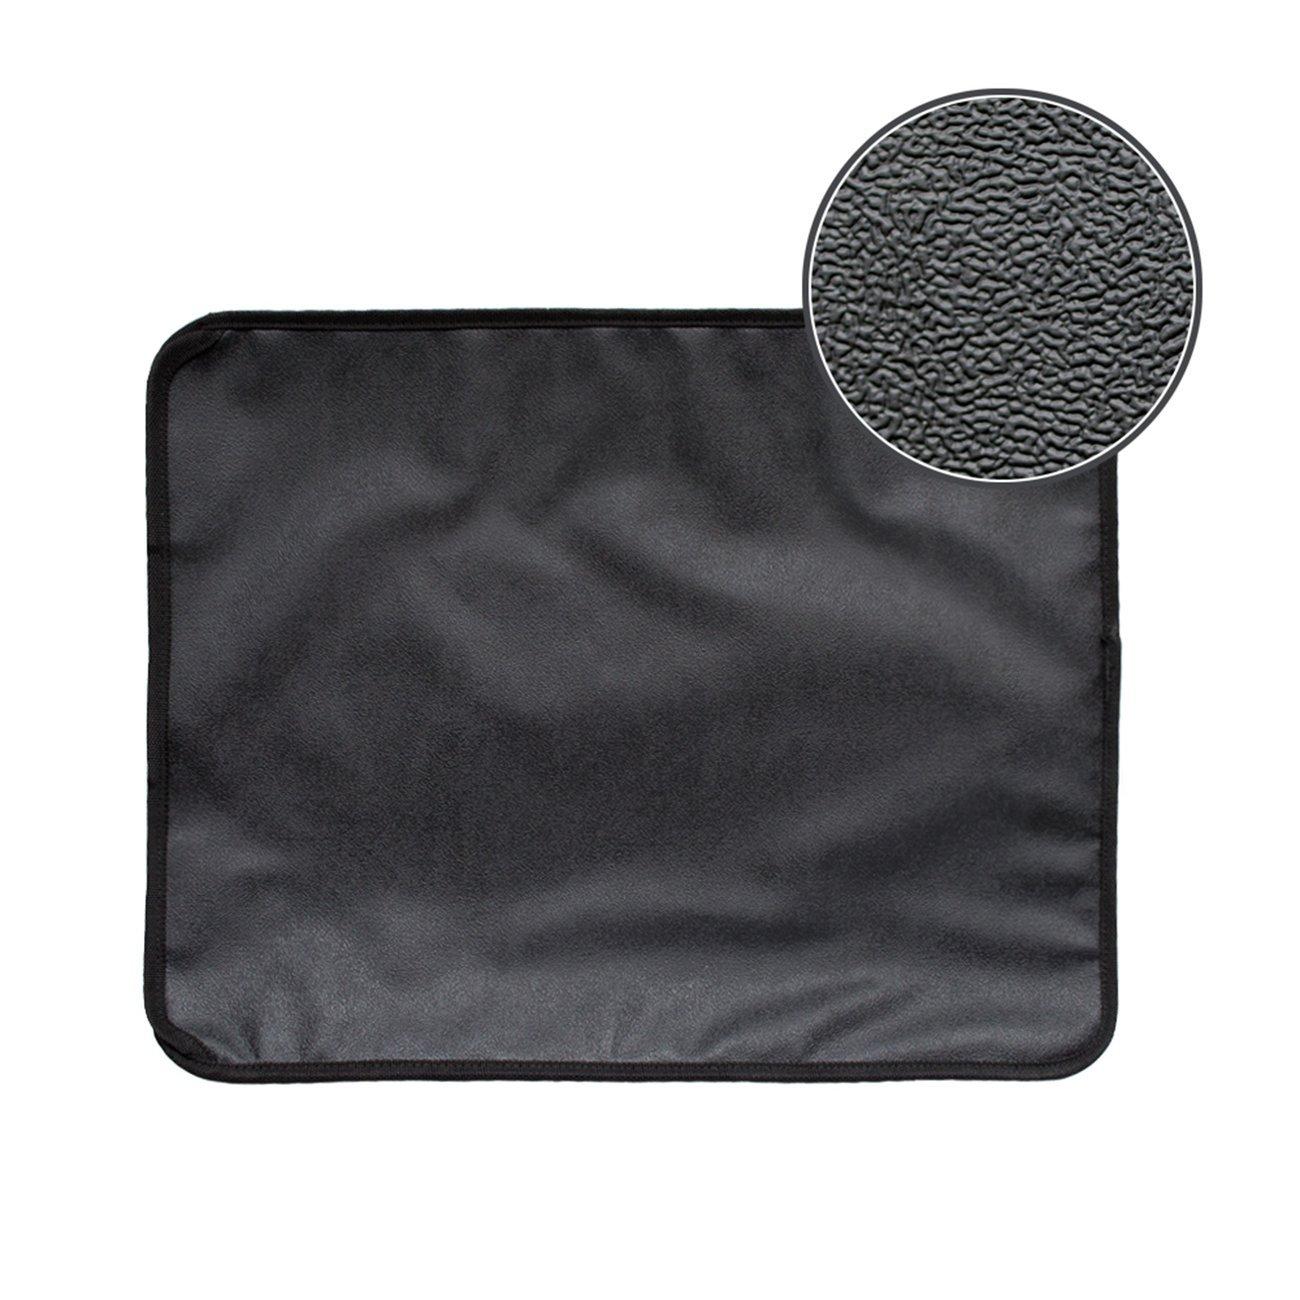 High-elastic EVA Cat Litter Mat Black Double-Layer Cat Litter Trapper Mat With Waterproof Bottom Layer Soft Cat Cushion